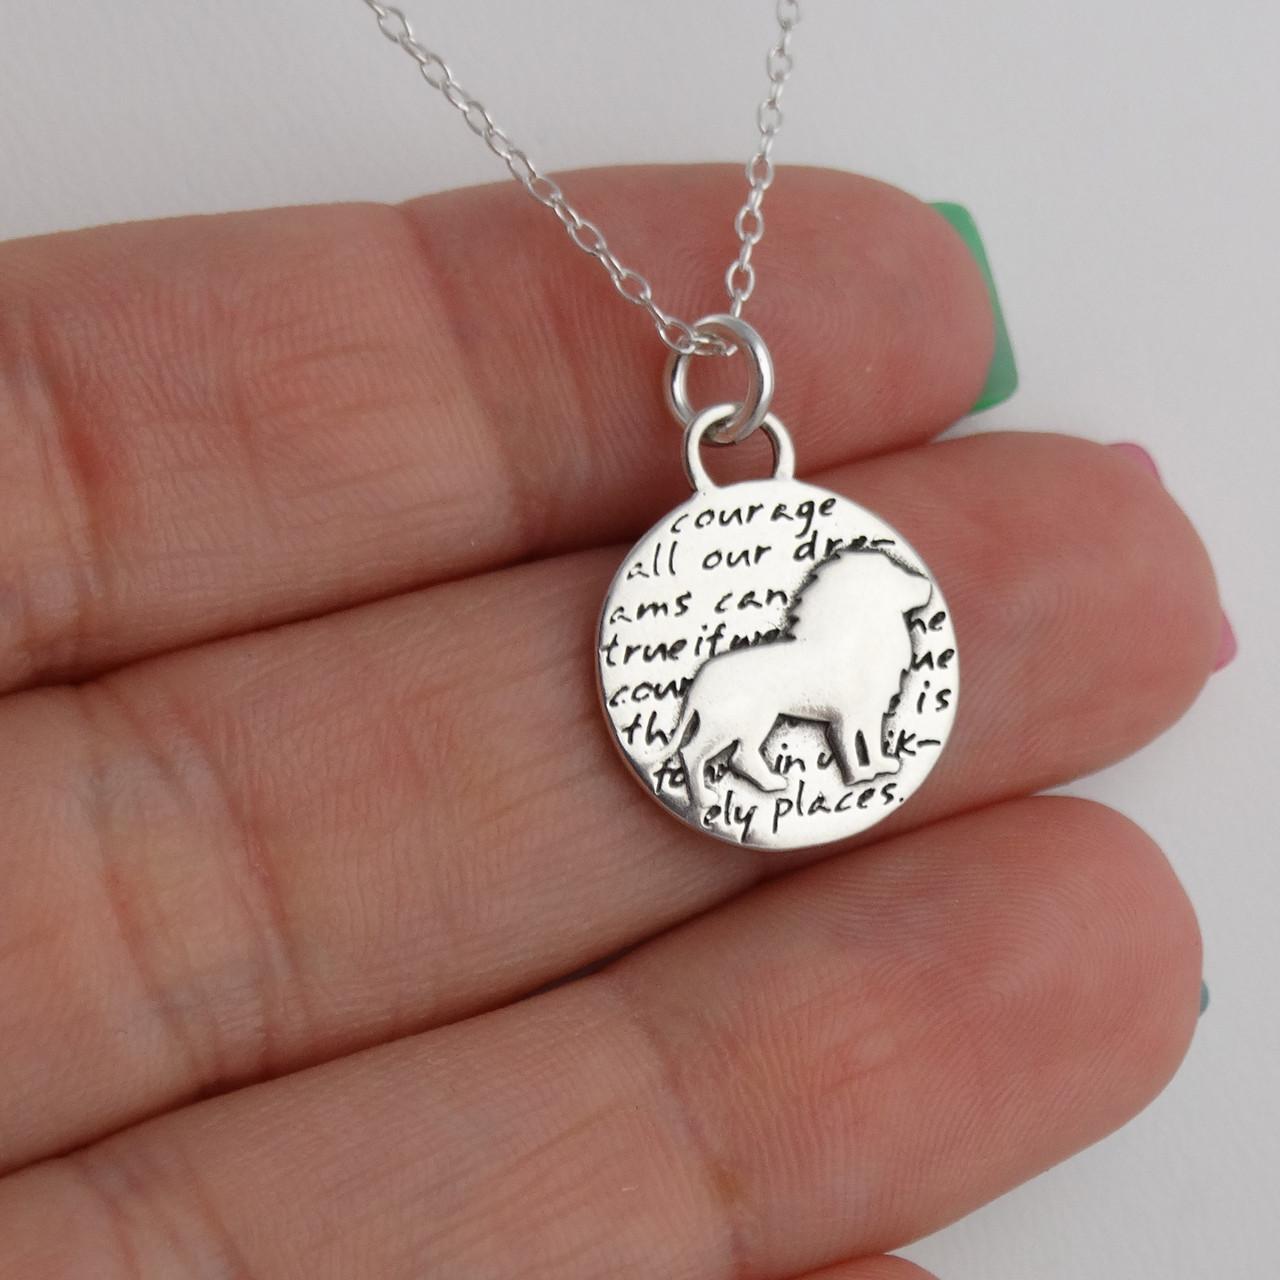 Koala Charm Necklace 950 Sterling Silver Handmade Inspirational Pendant Bear